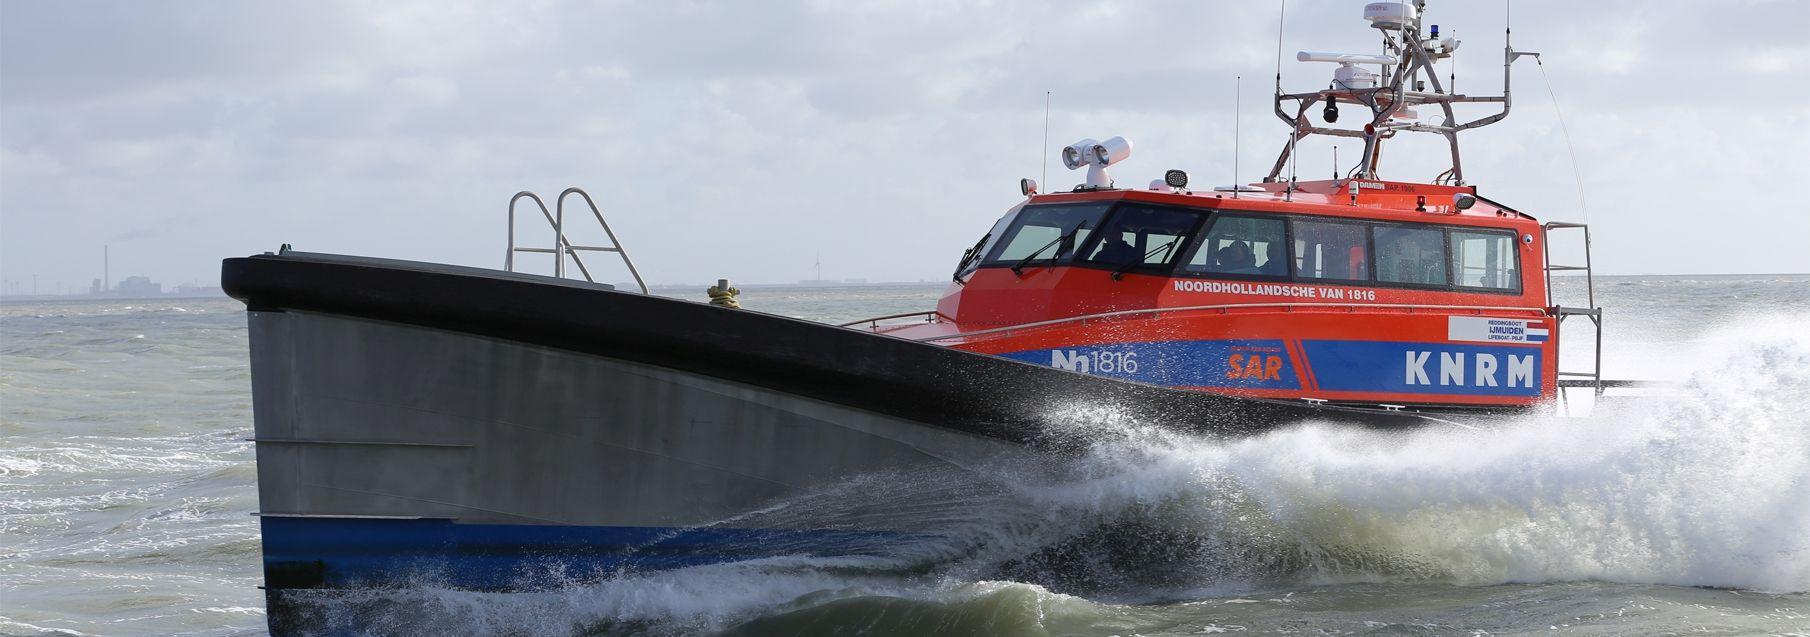 Reddingboot Nh1816